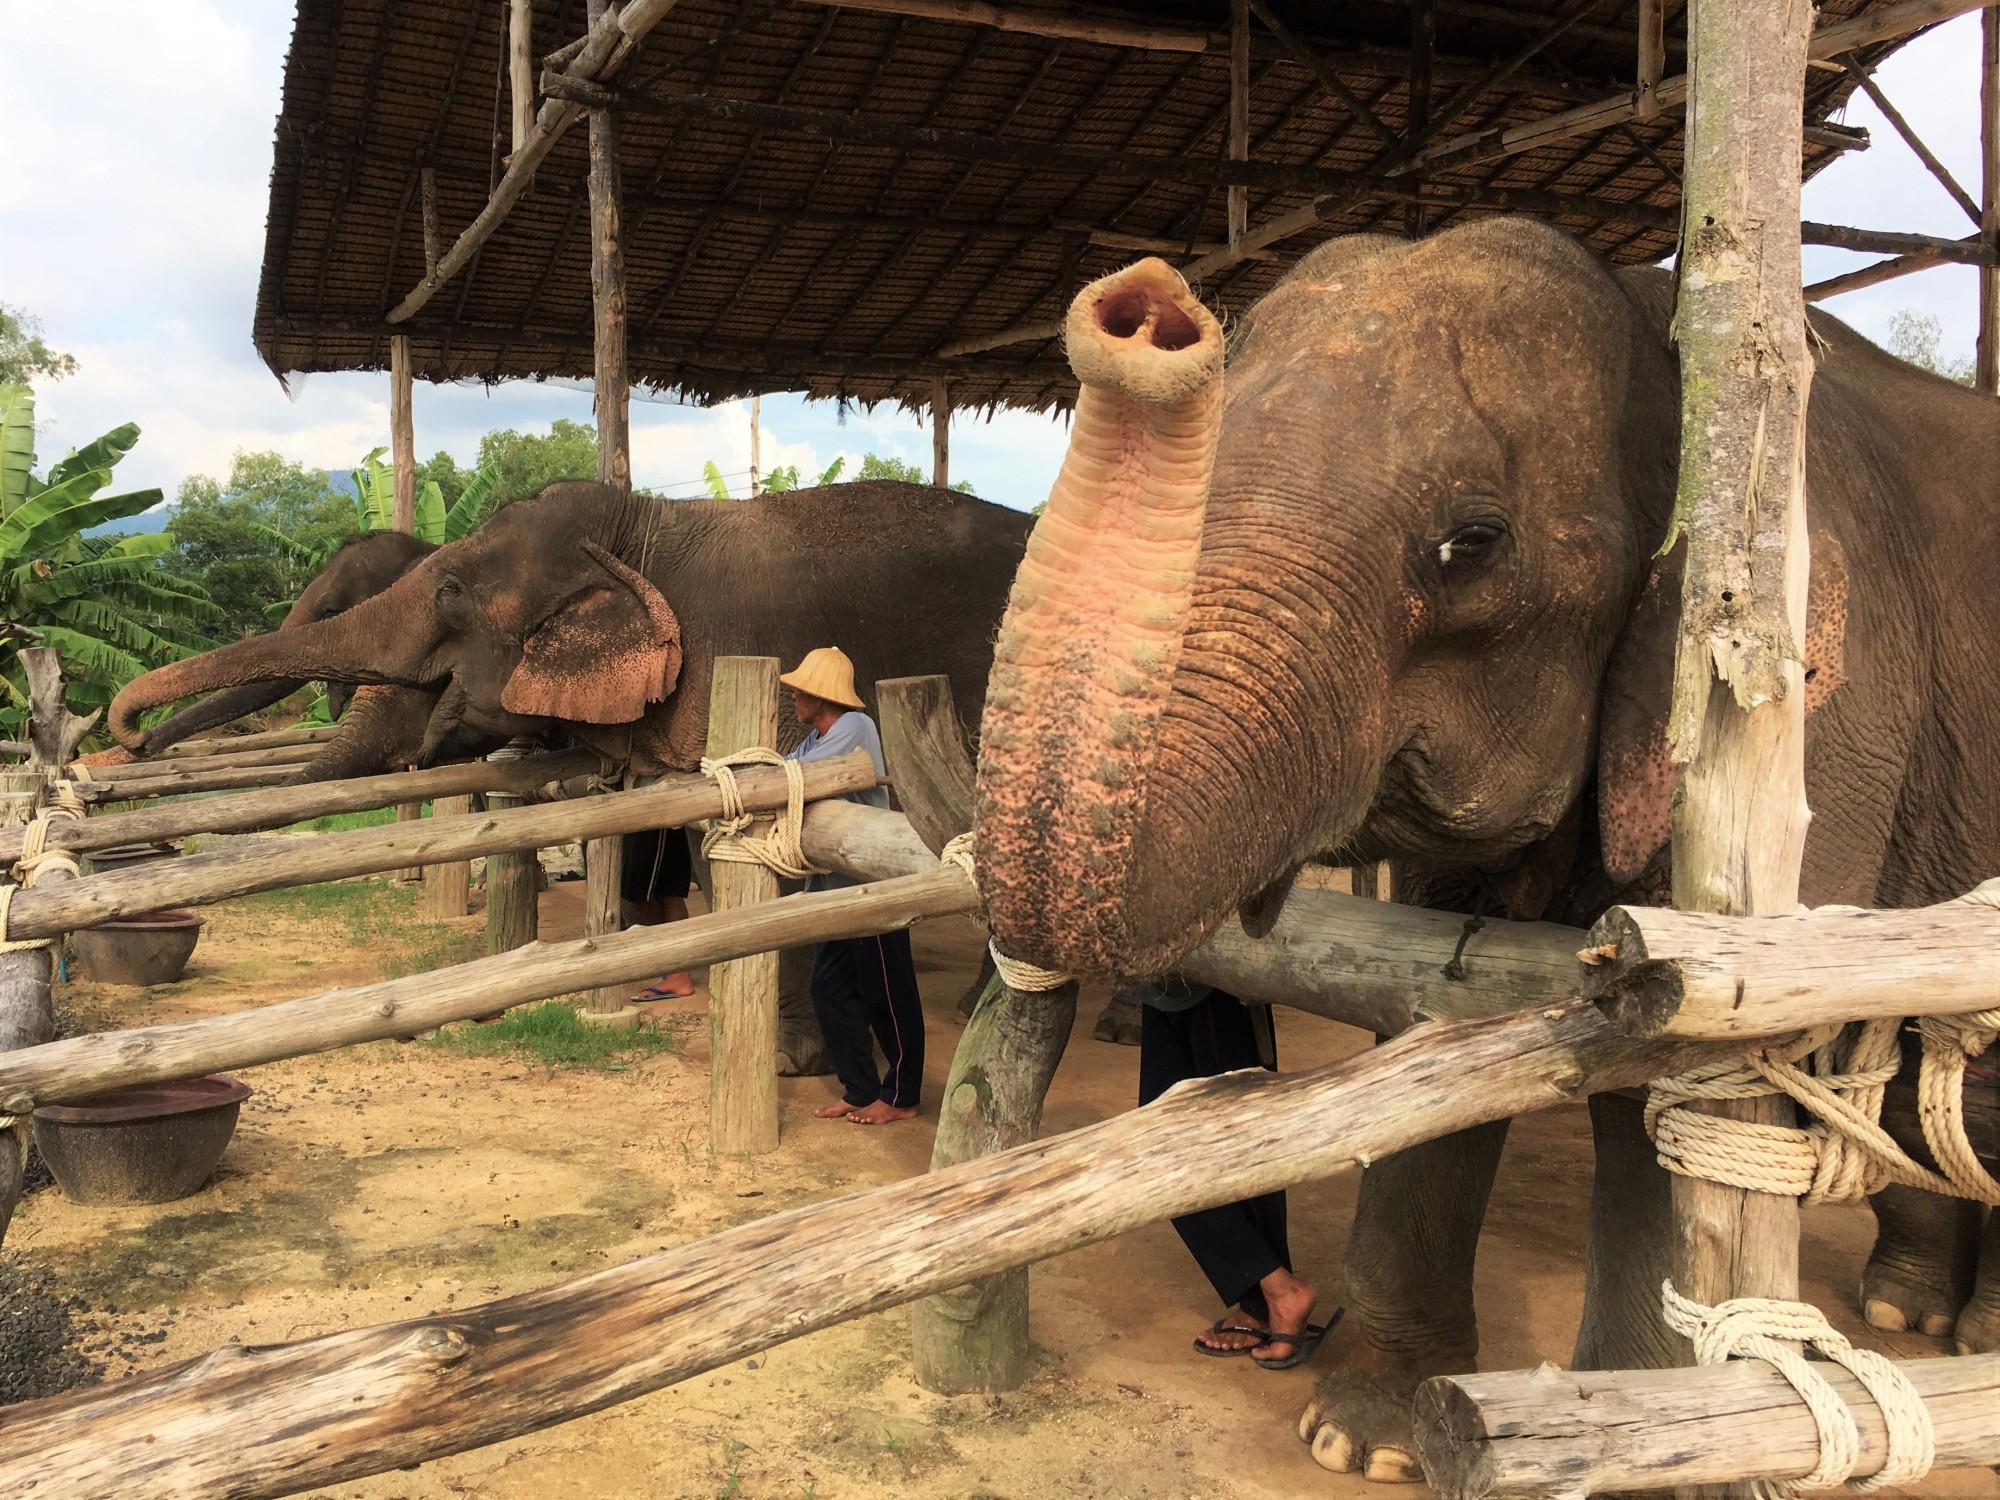 The Seaside Retreat Elephant Feeding, Khao Lak, Thailand